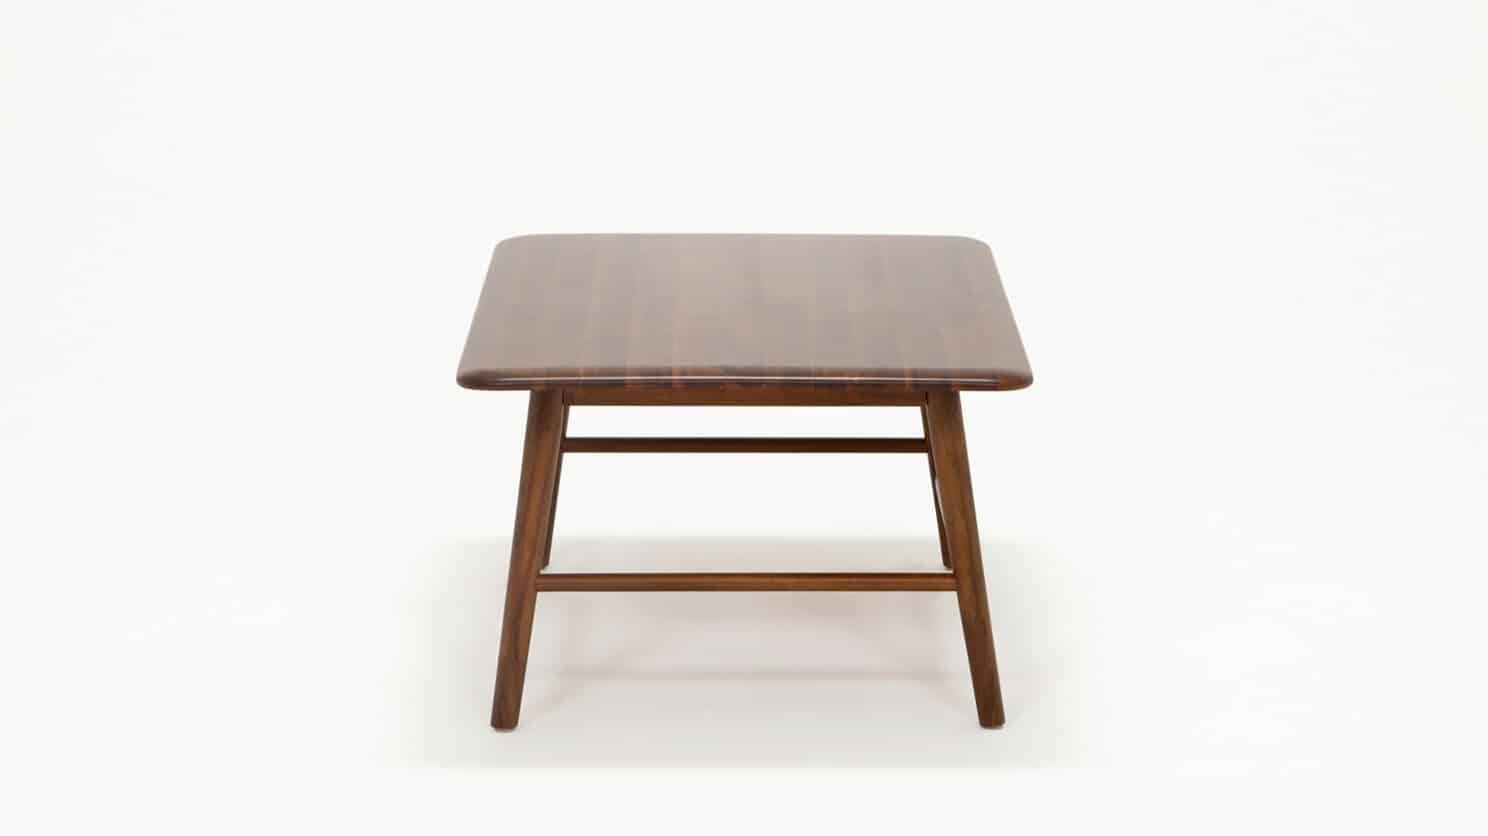 7110 032 49 3 coffee tables kacia rectangular coffee table side 01